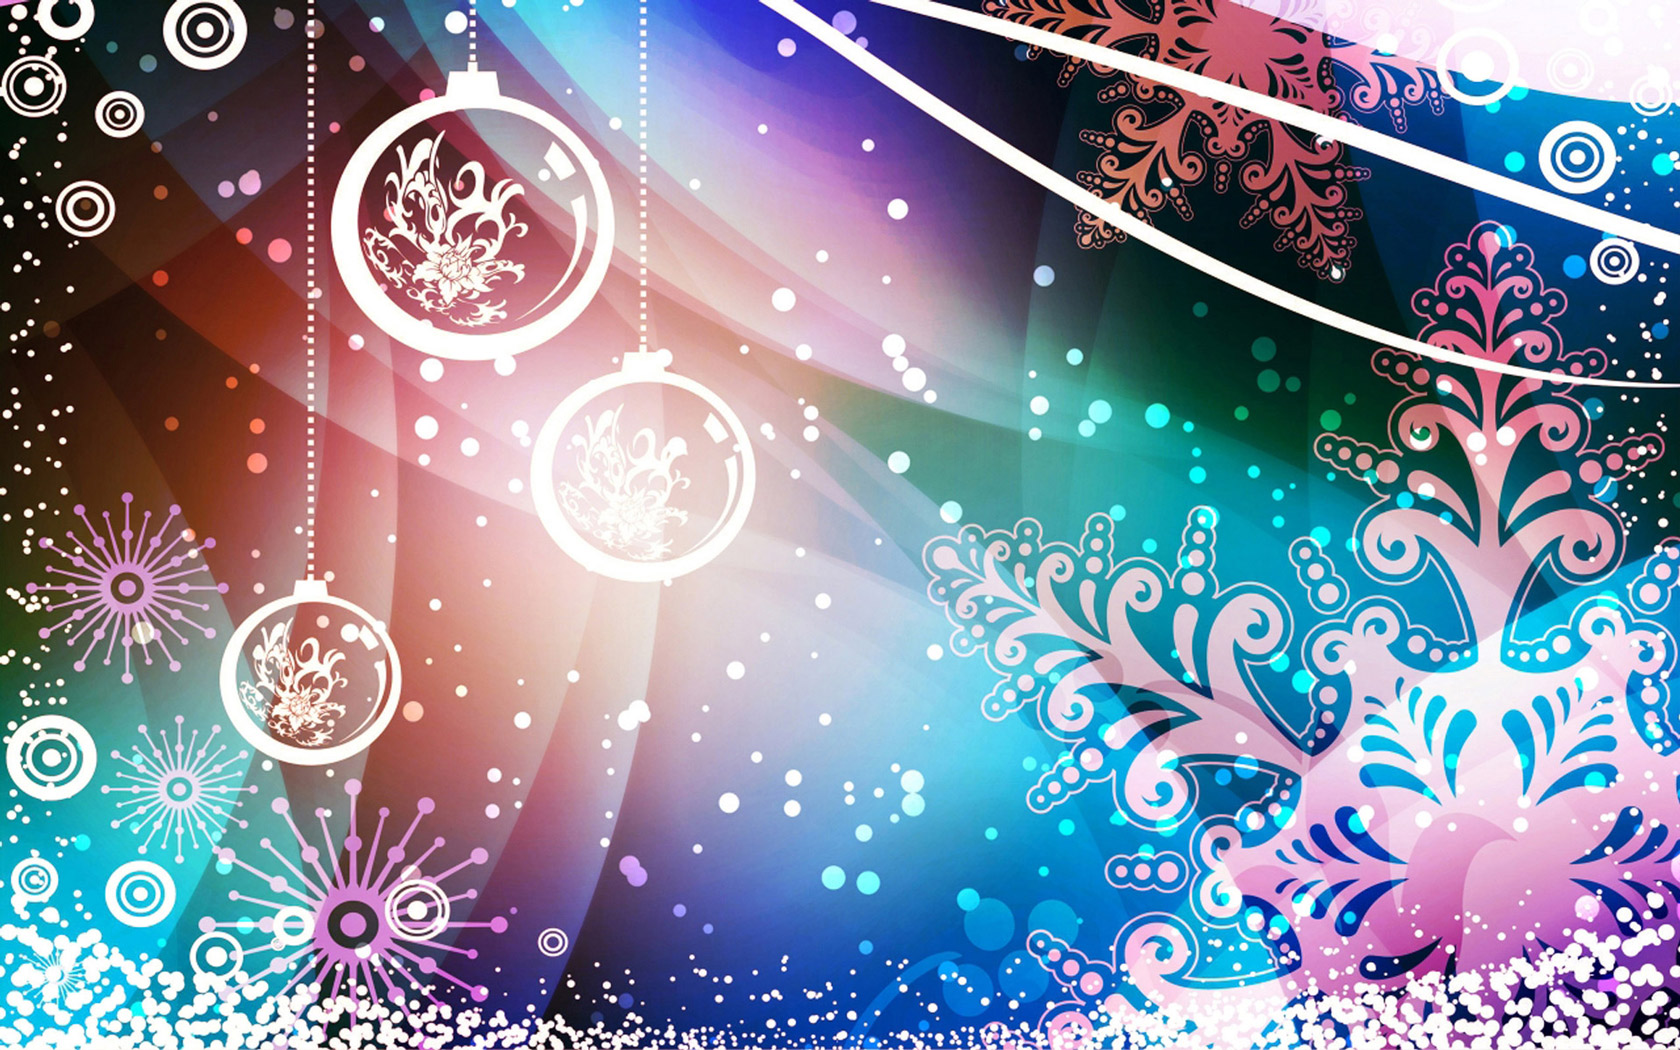 christian christmas wallpaper for desktop   wwwwallpapers in hdcom 1680x1050